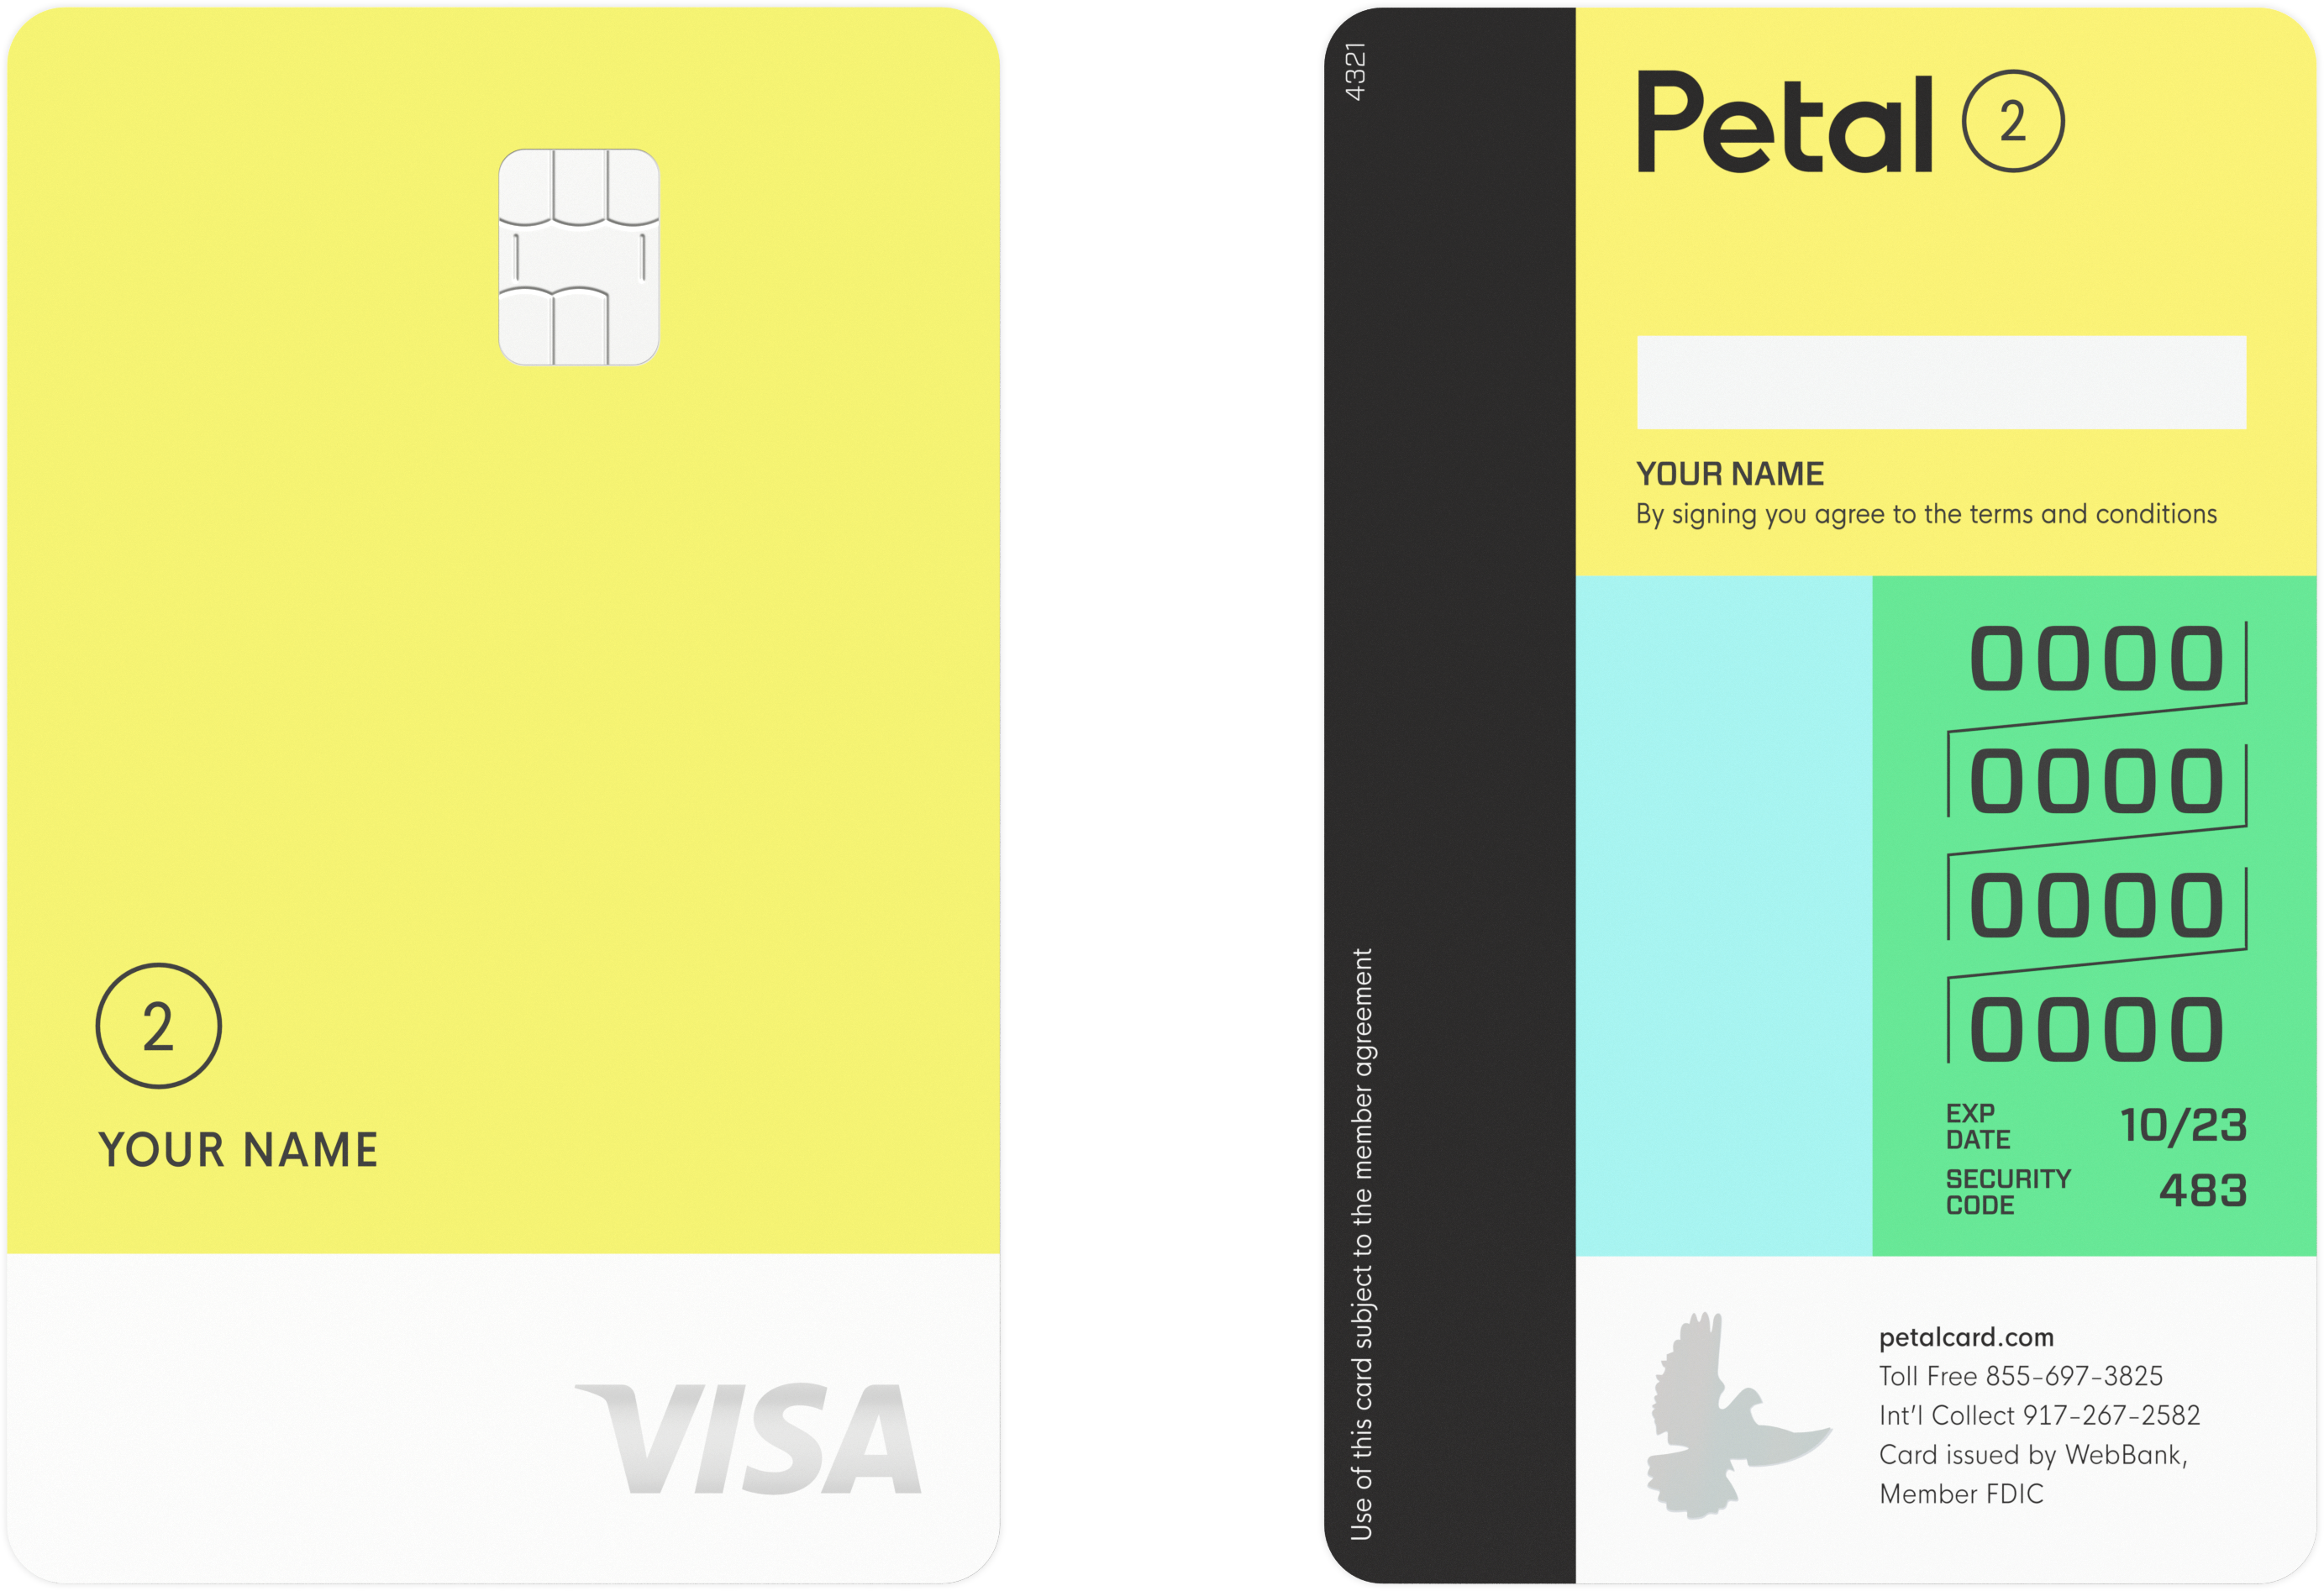 Petal 2 Visa Card